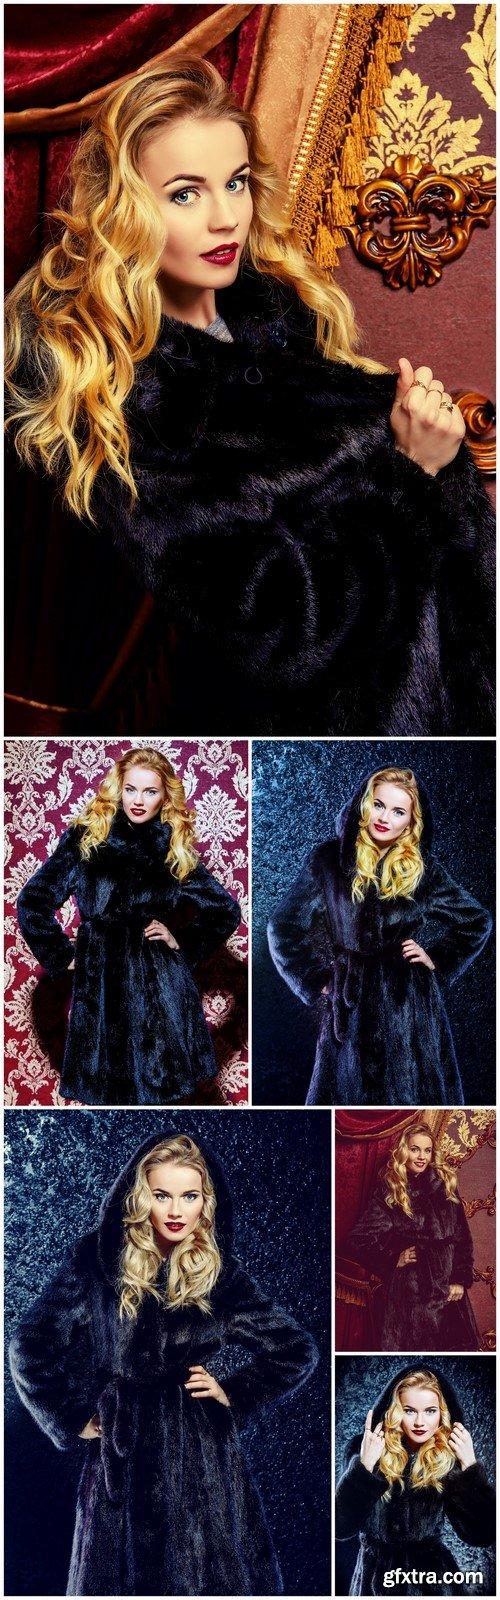 Fashion beautiful blonde woman wearing mink fur coat 6X JPEG